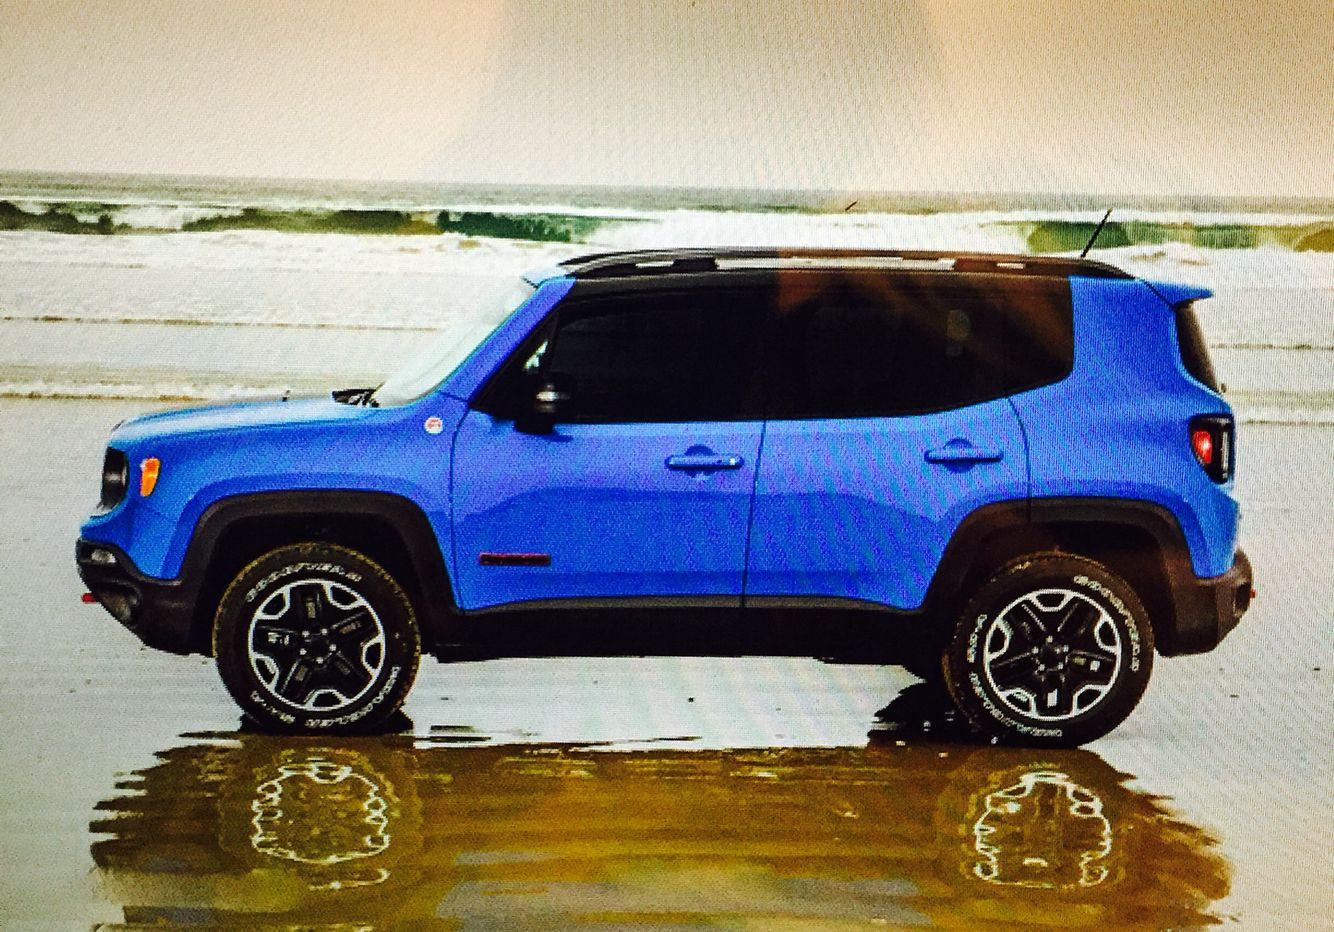 Sierra Blue Jeep Renegade 2015 Jeep renegade, Blue jeep